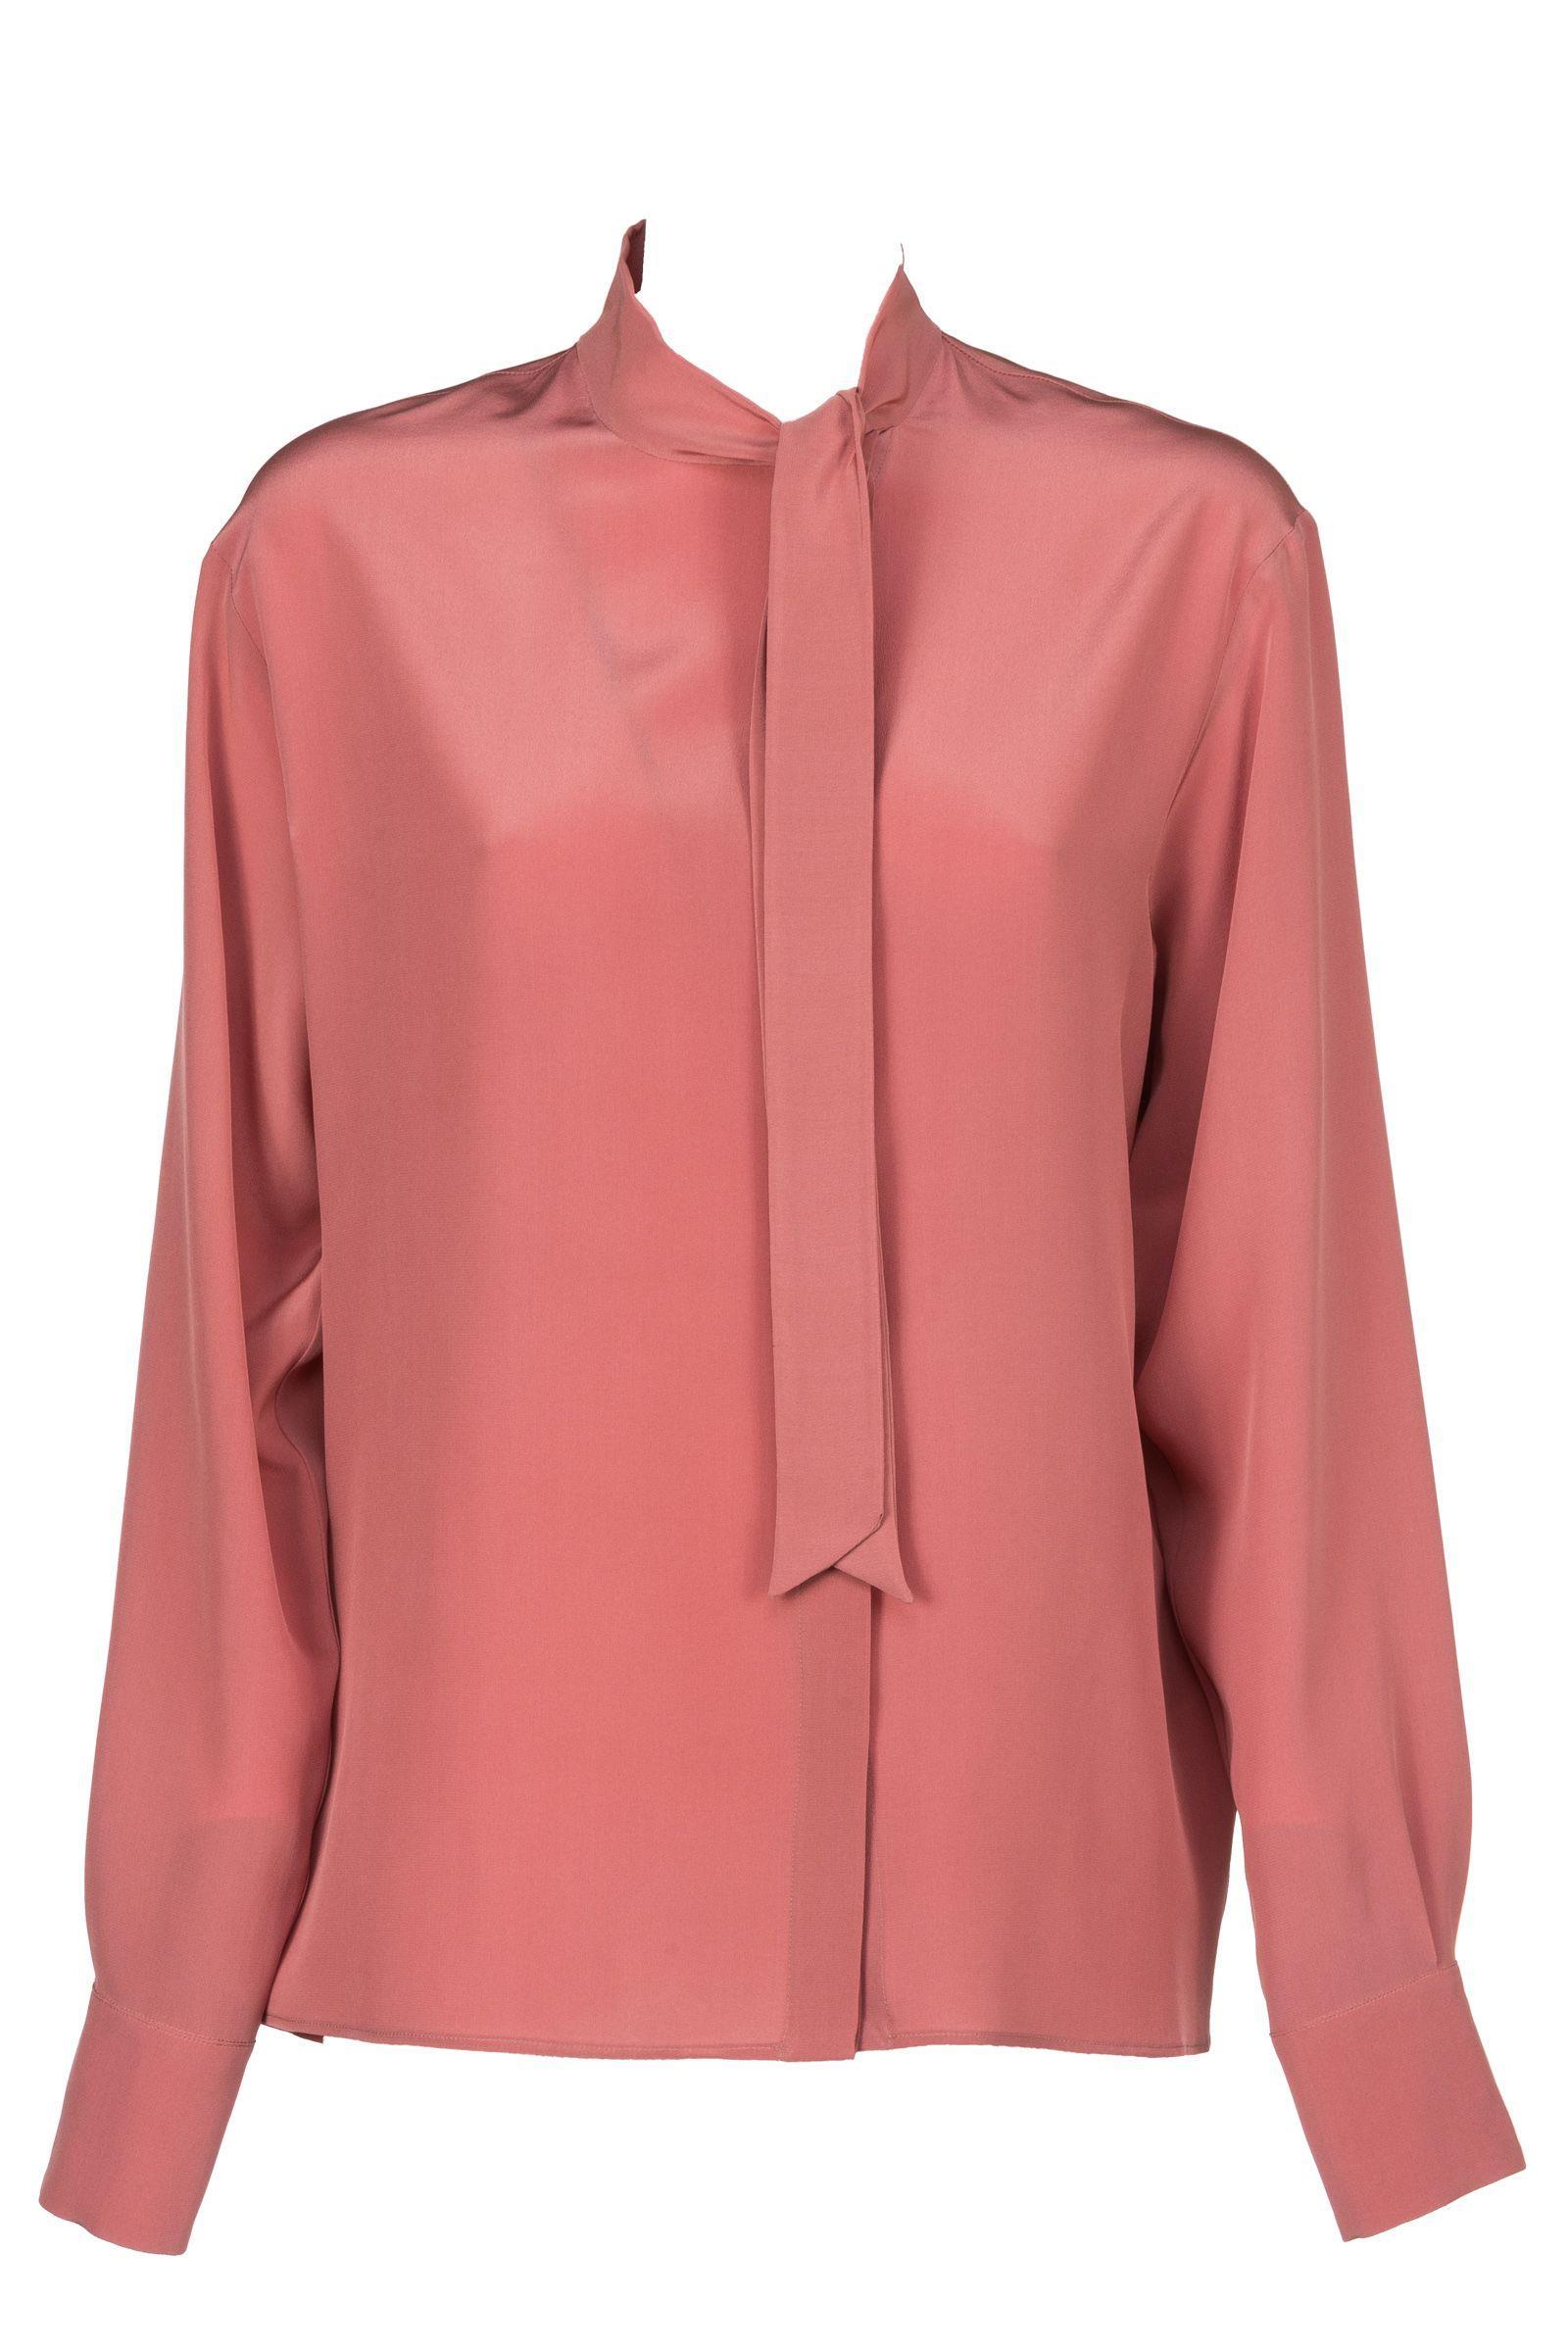 Bottega Veneta Silk Shirt In Dusty Rose